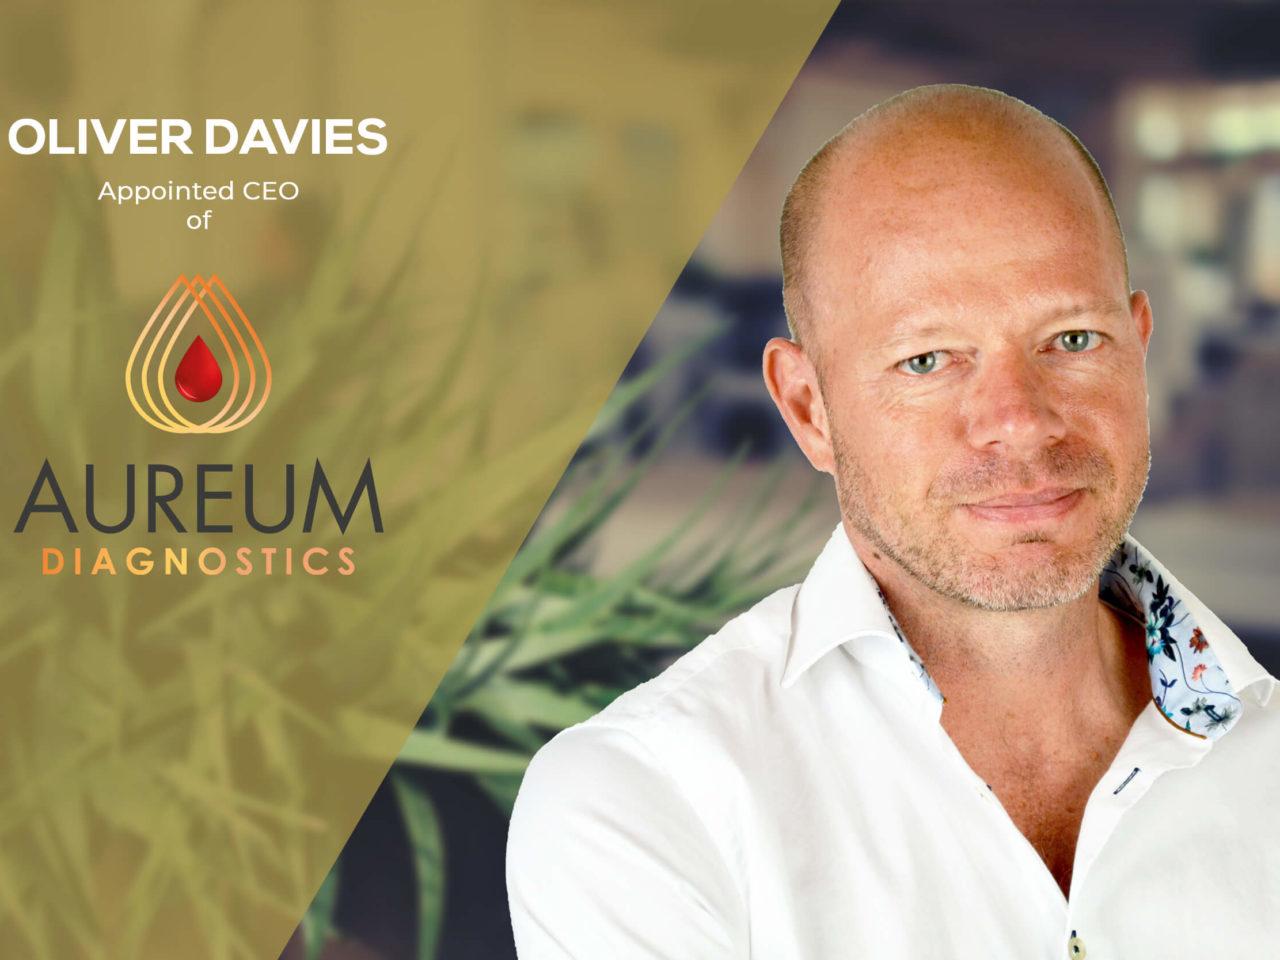 Oliver Davies – Appointed CEO of Aureum Diagnostics